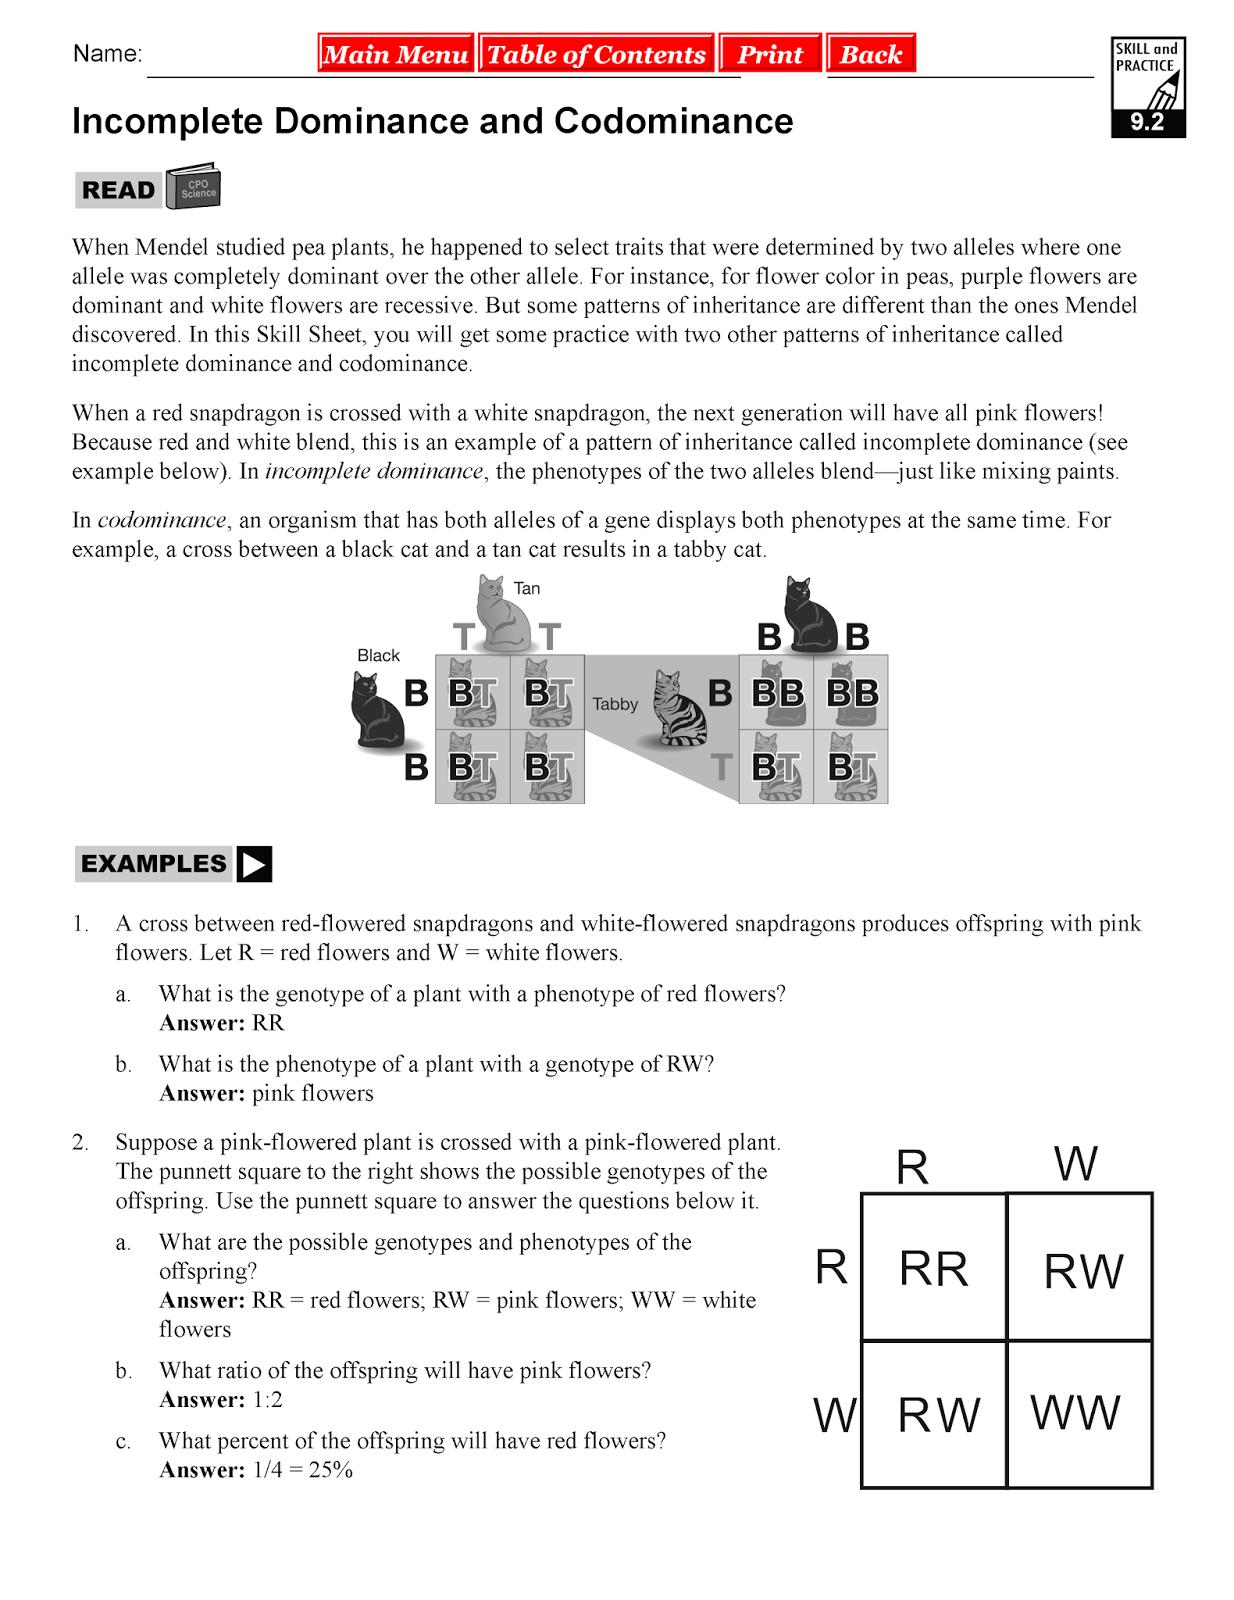 Worksheet Incomplete And Codominance Worksheet Worksheet